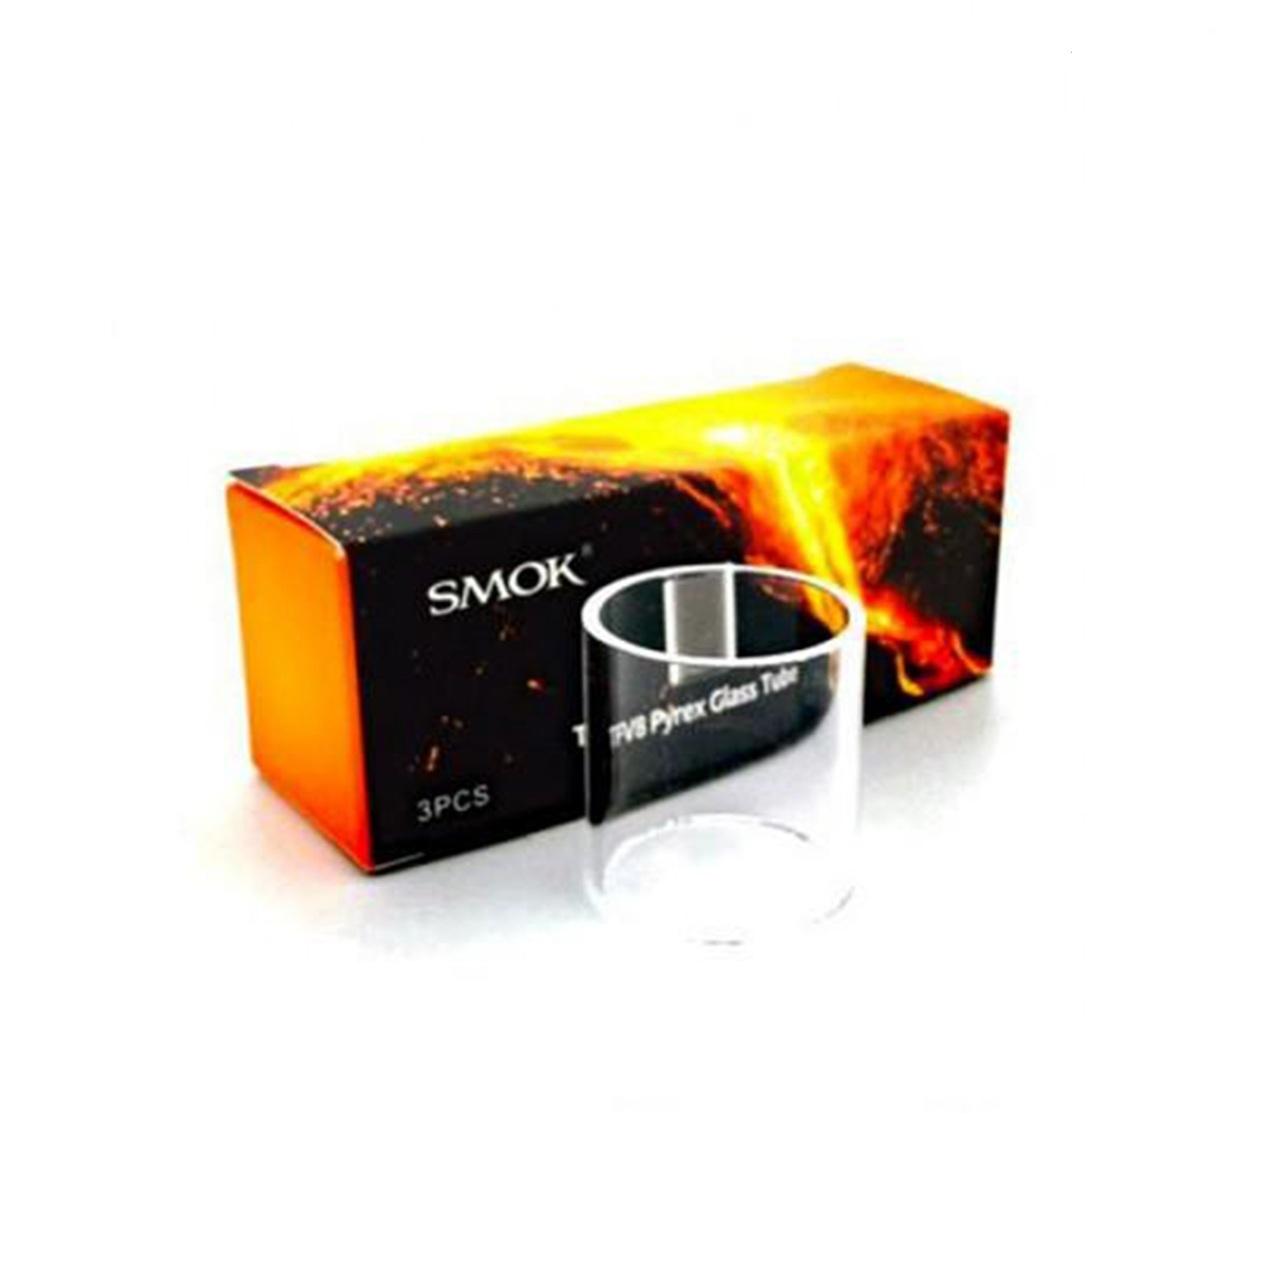 smok-tfv8-baby-beast-replacement-glass-by-smoktech-for-ecigforlife.jpg